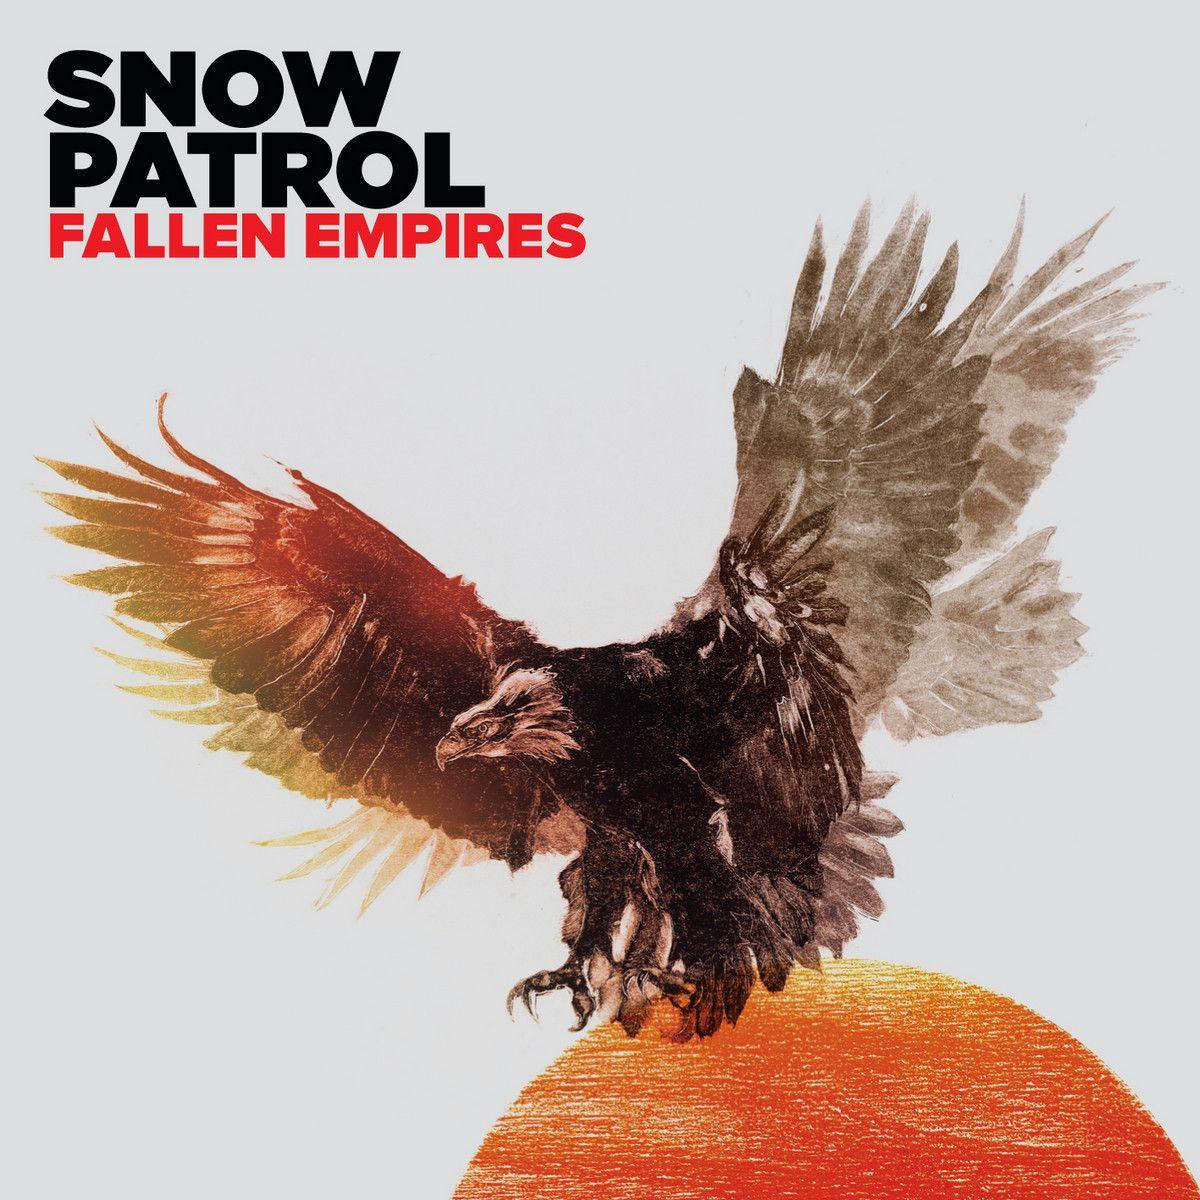 Snow Patrol - Fallen Empires album cover